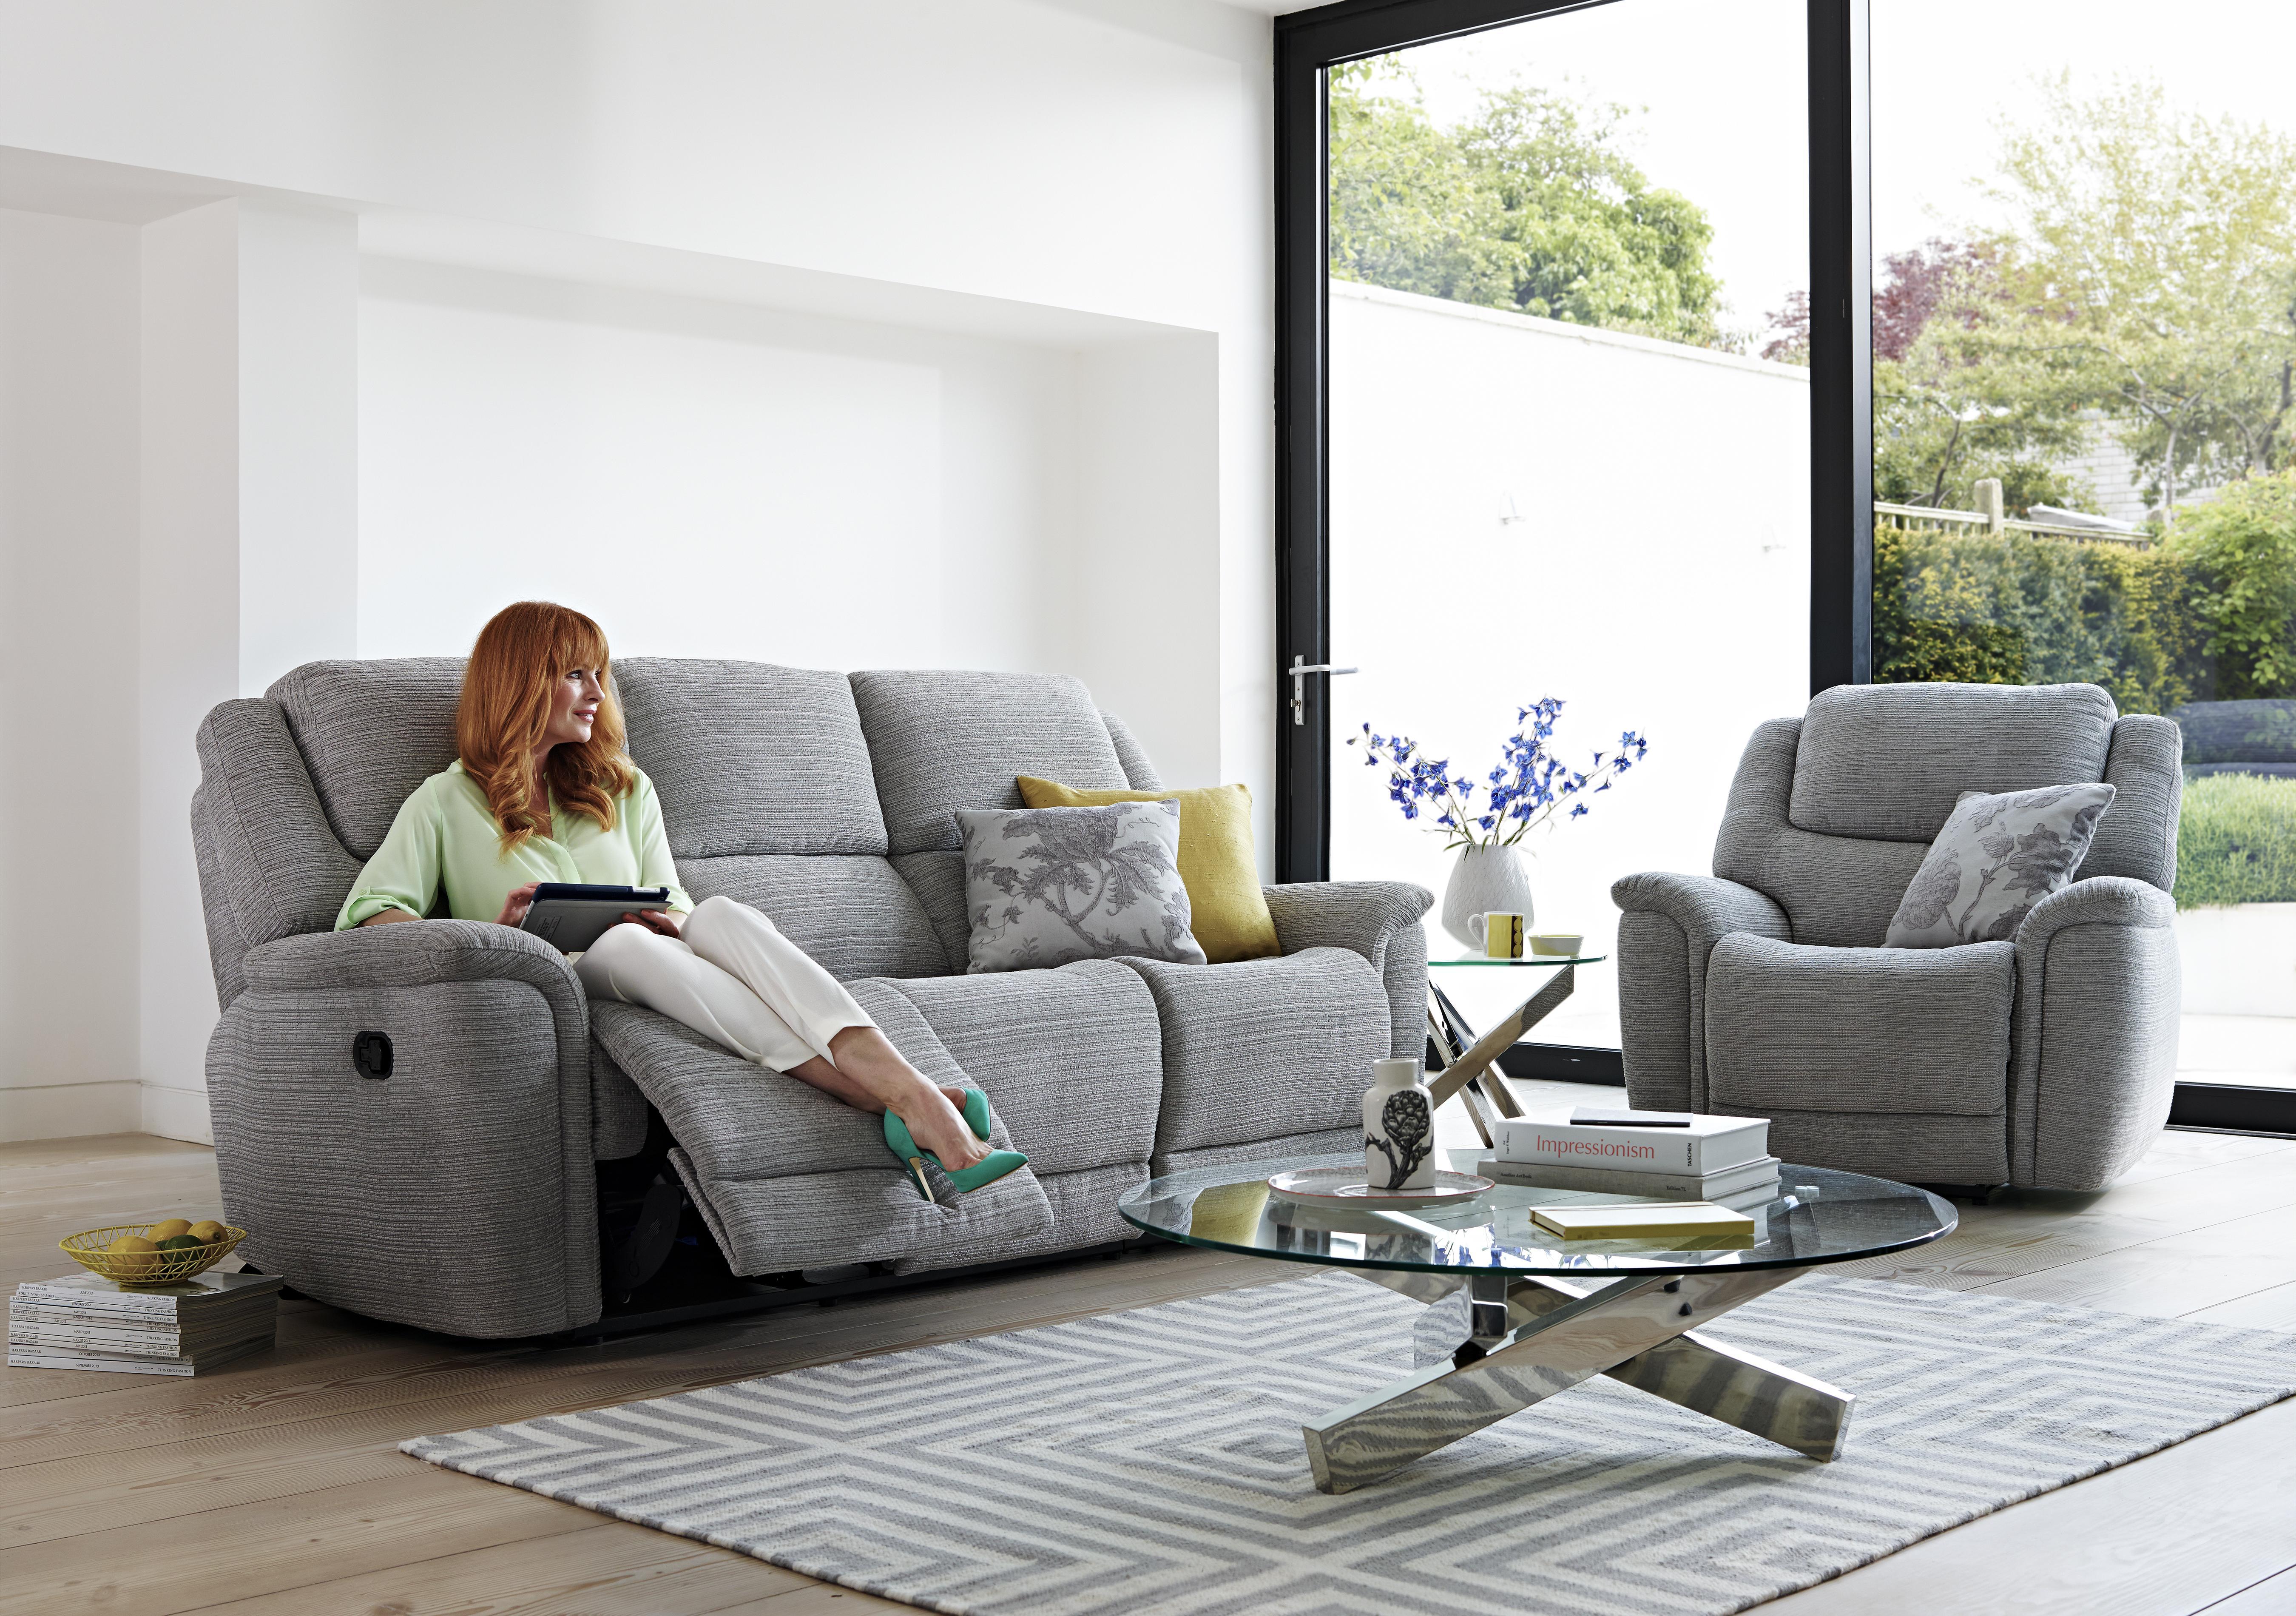 & Sheridan 2 Seater Fabric Recliner Sofa - Furniture Village islam-shia.org